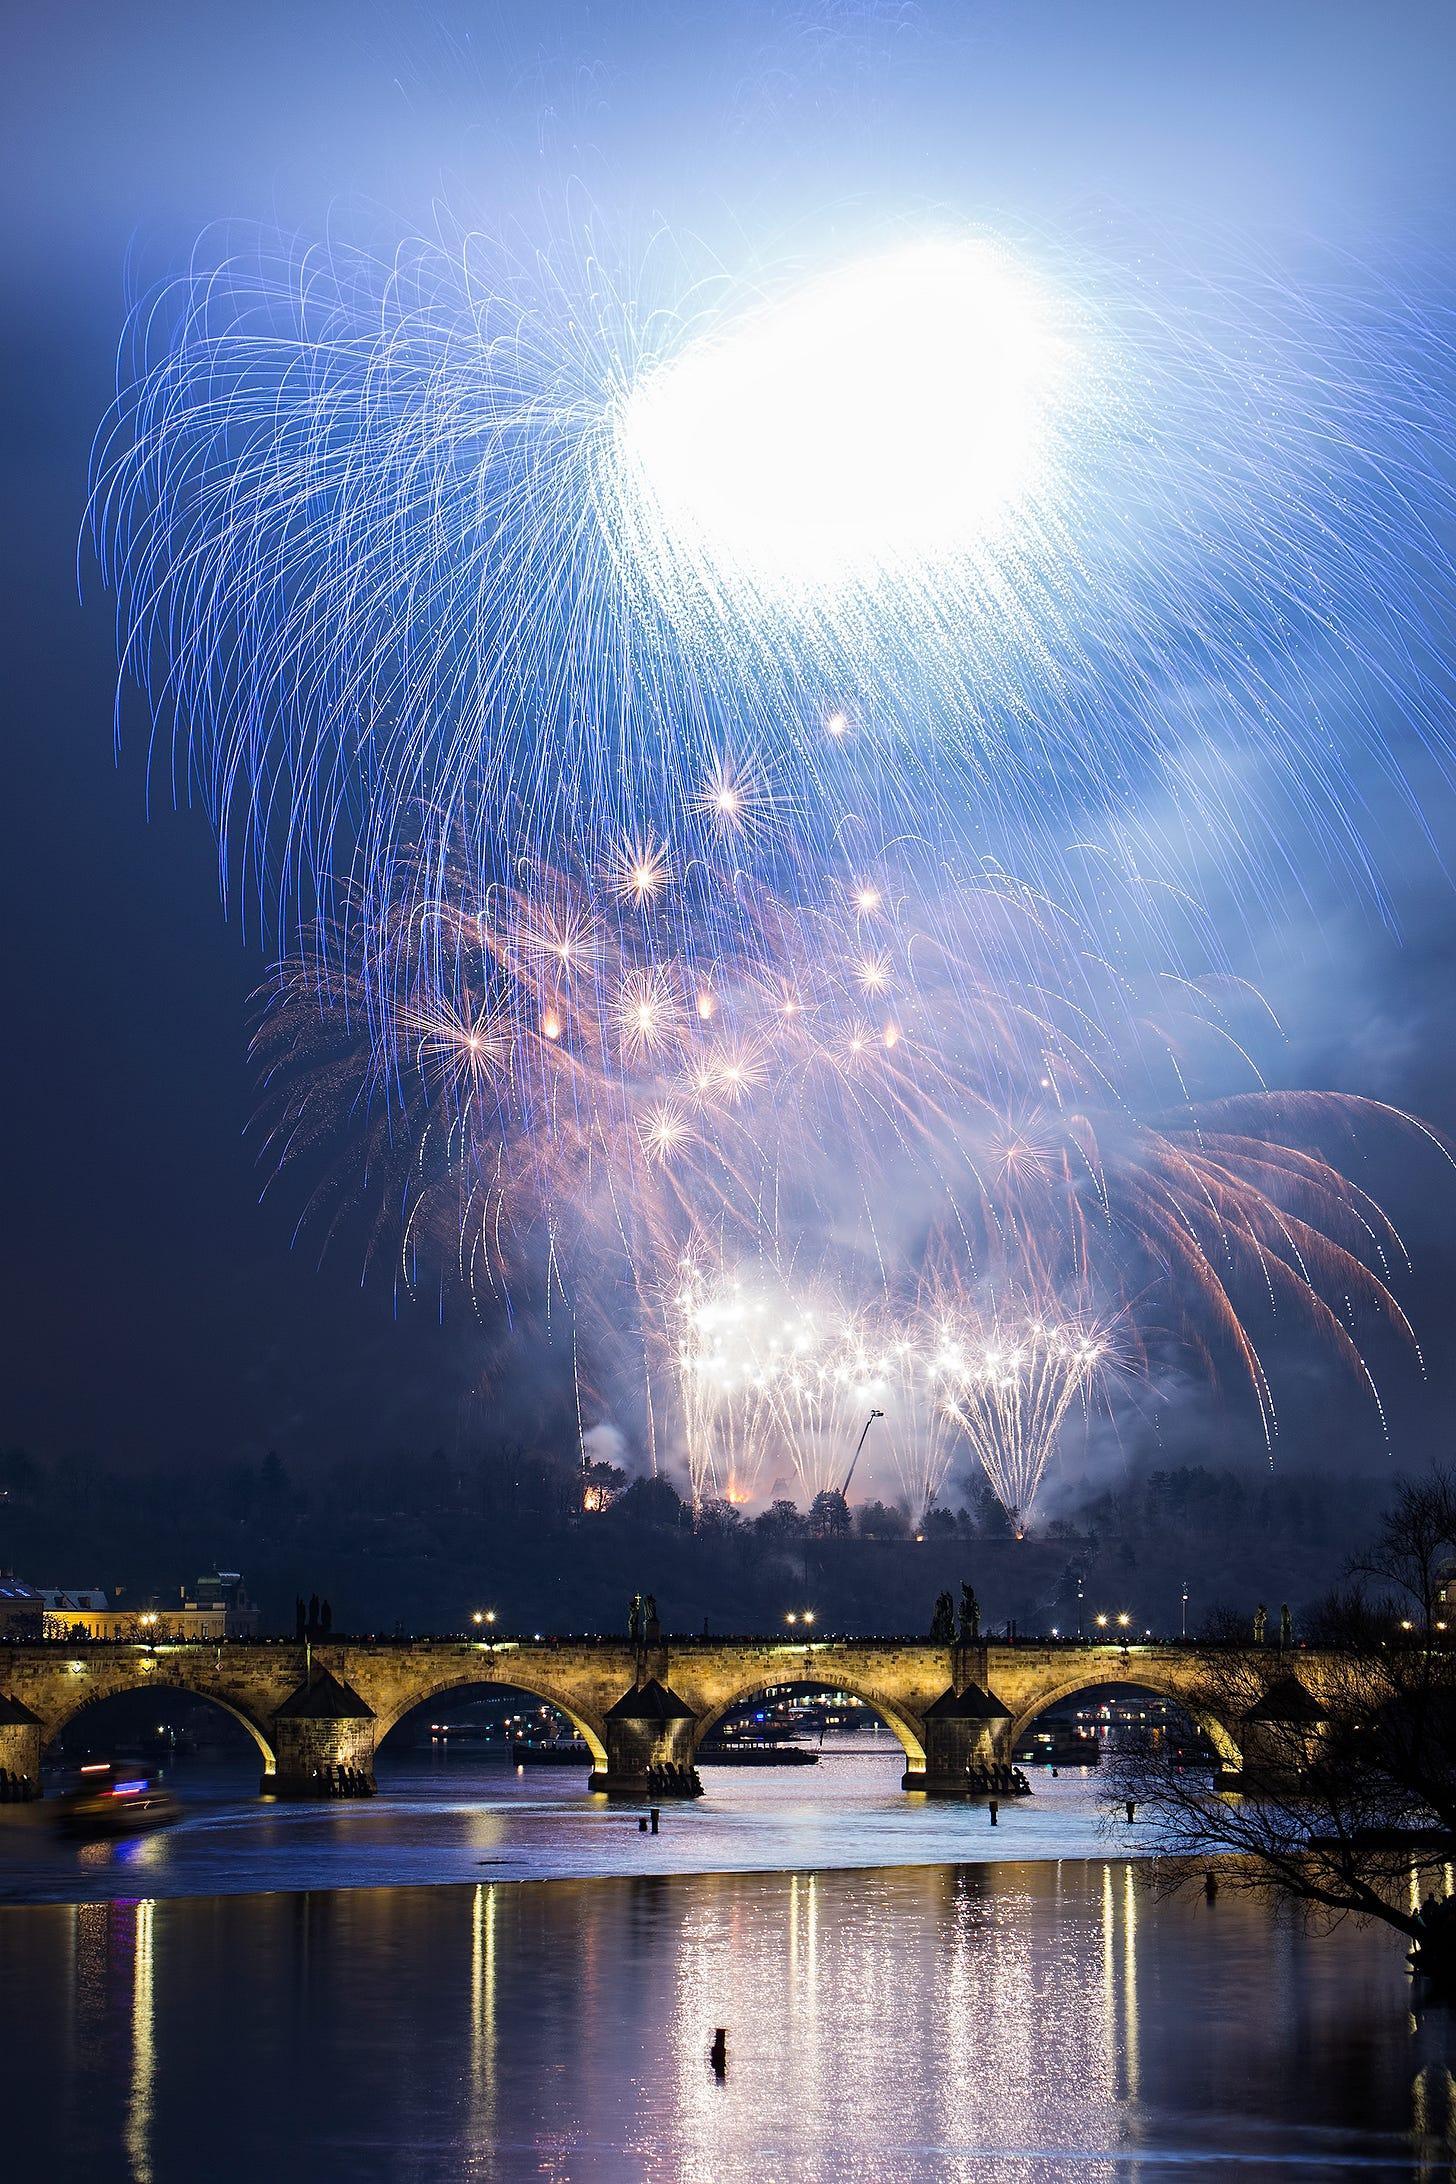 New Year's Eve fireworks in Prague, Czechia.